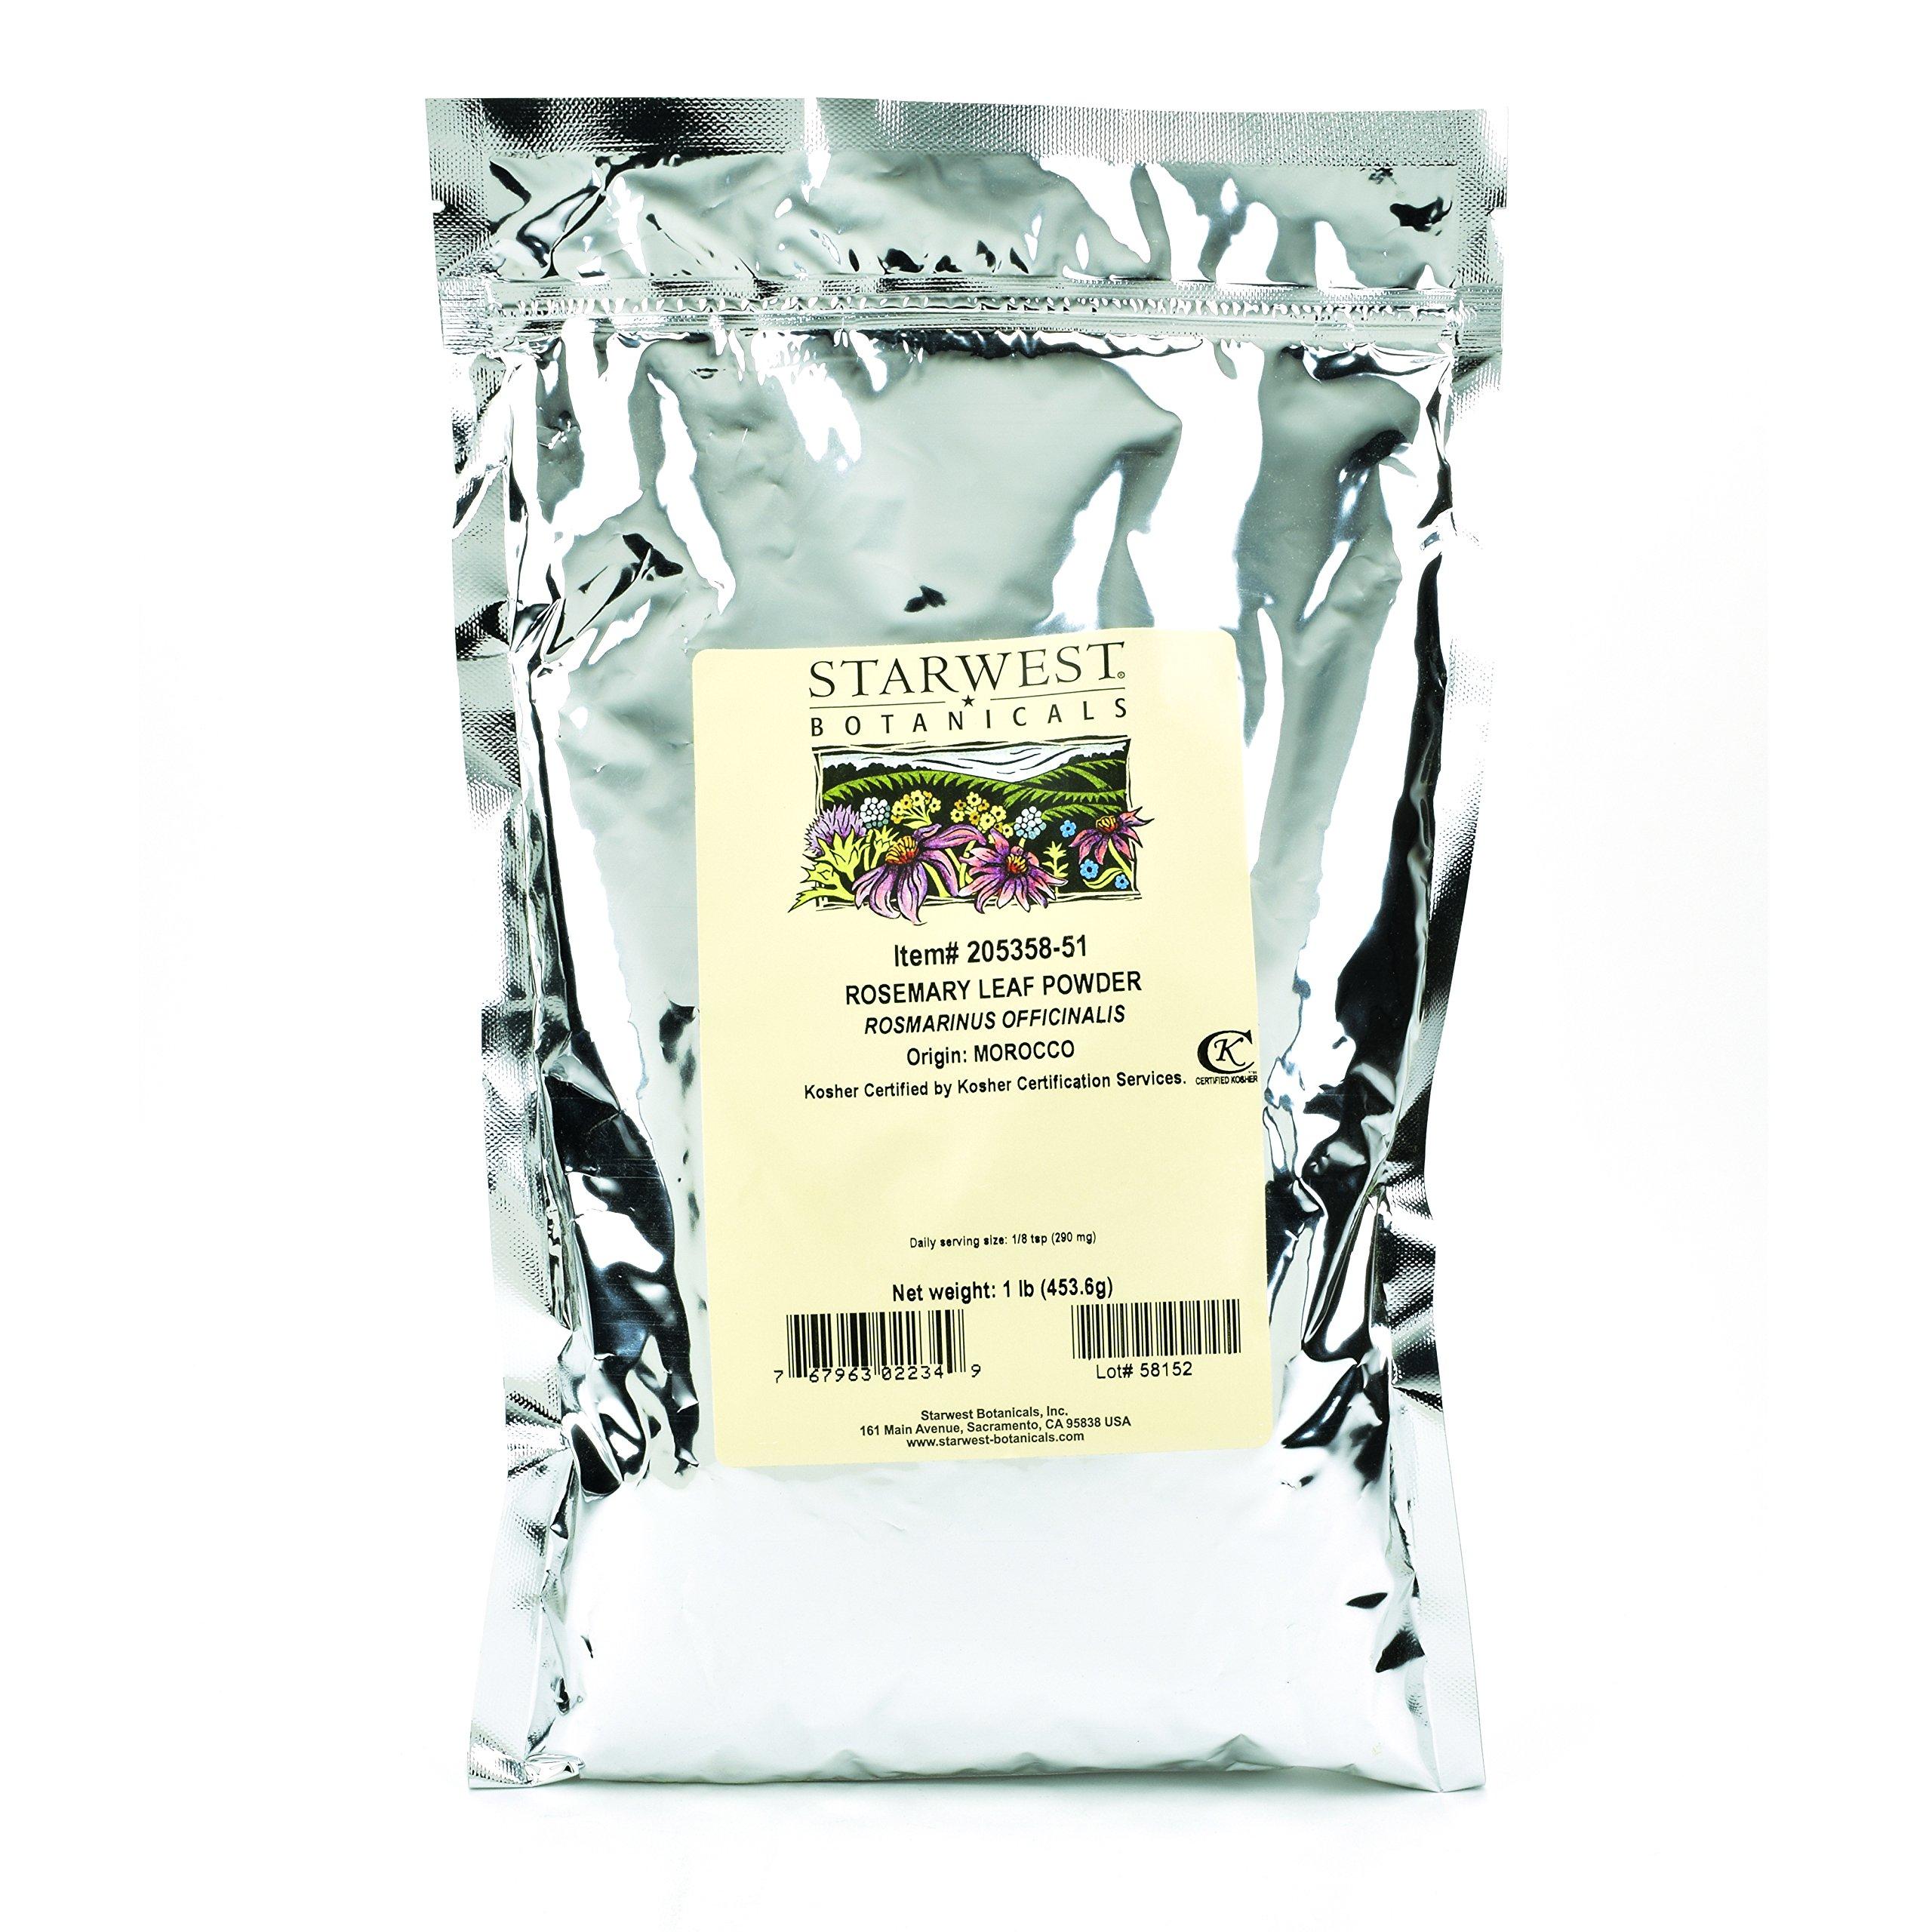 Starwest Botanicals Rosemary Leaf Powder, 1 Pound